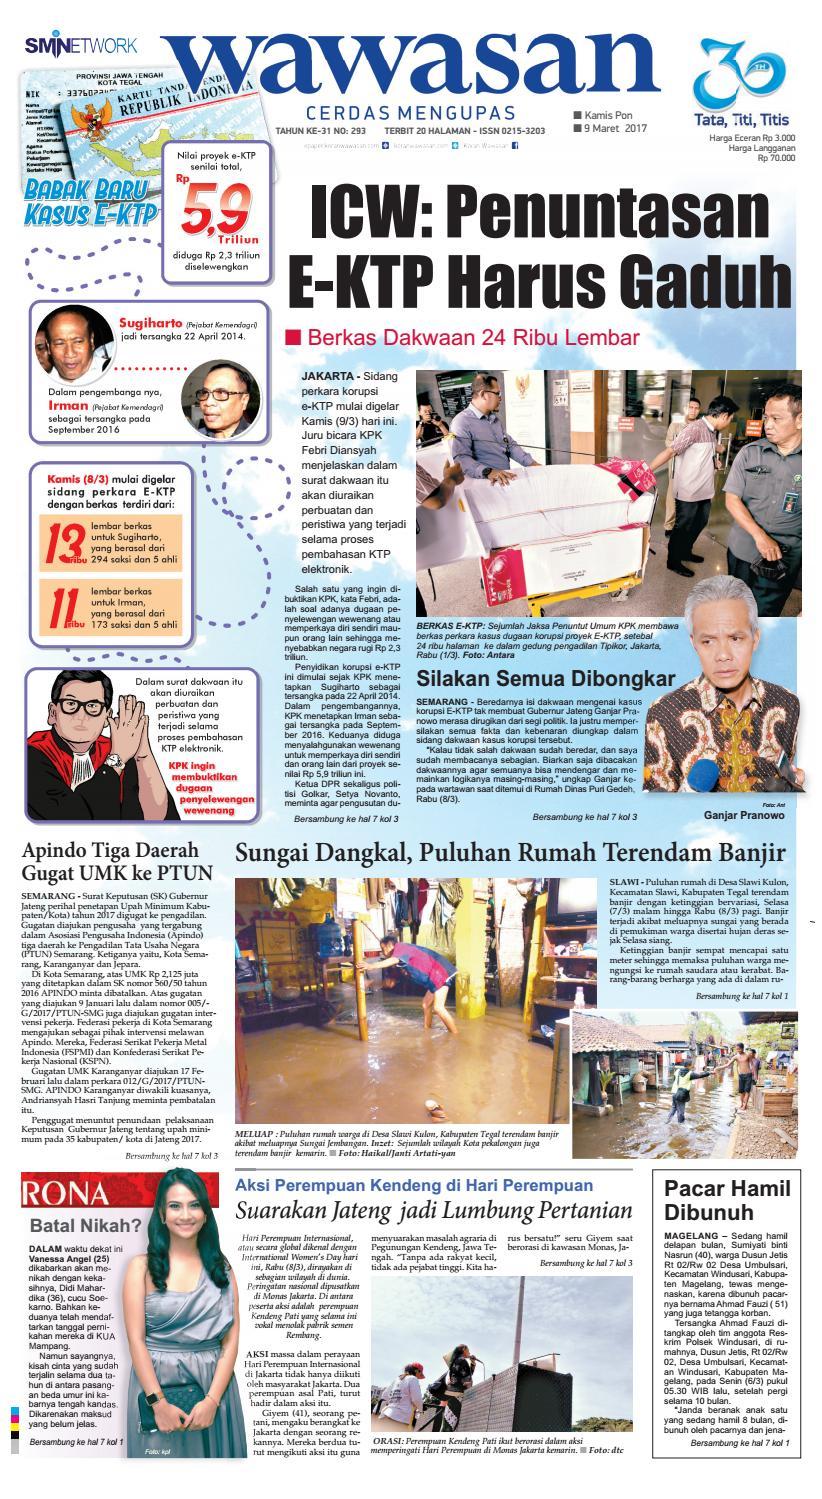 Wawasan 09 Maret 2017 By Koran Pagi Issuu Produk Ukm Bumn Kain Batik Eksklusif Lasem Manuk